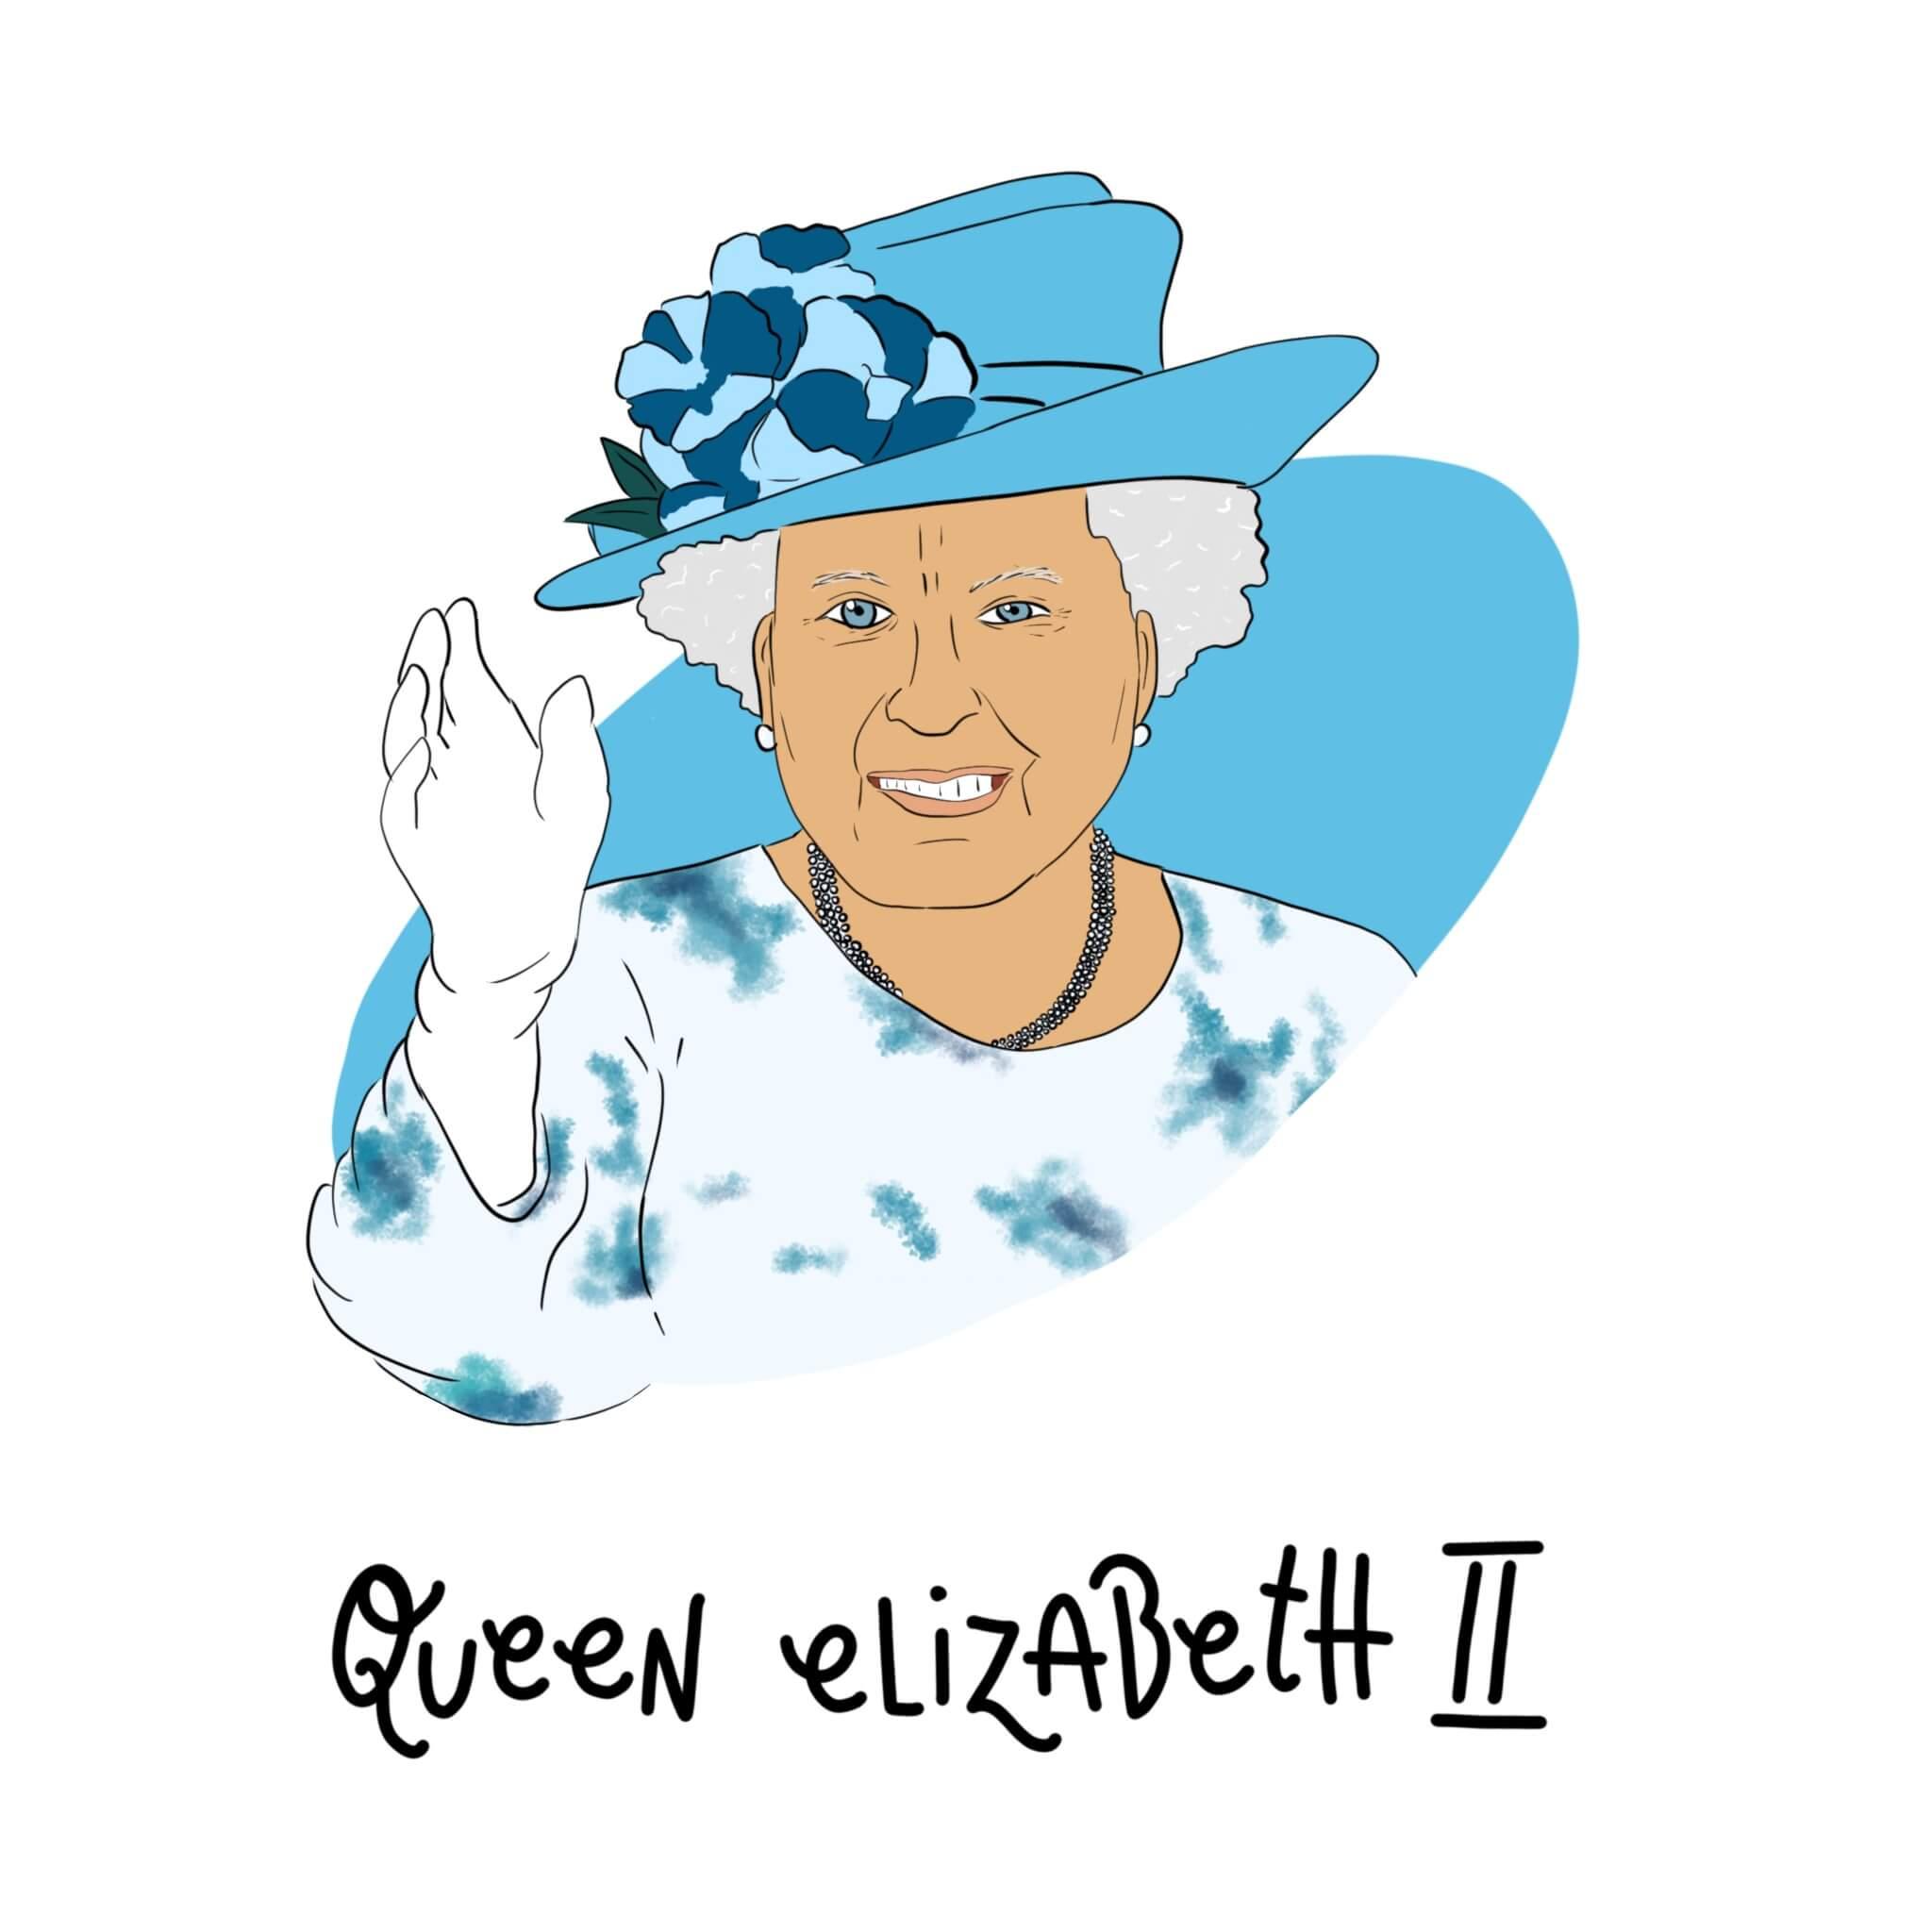 Queen Elizabeth II. Illustration by Jessica Ringelstein